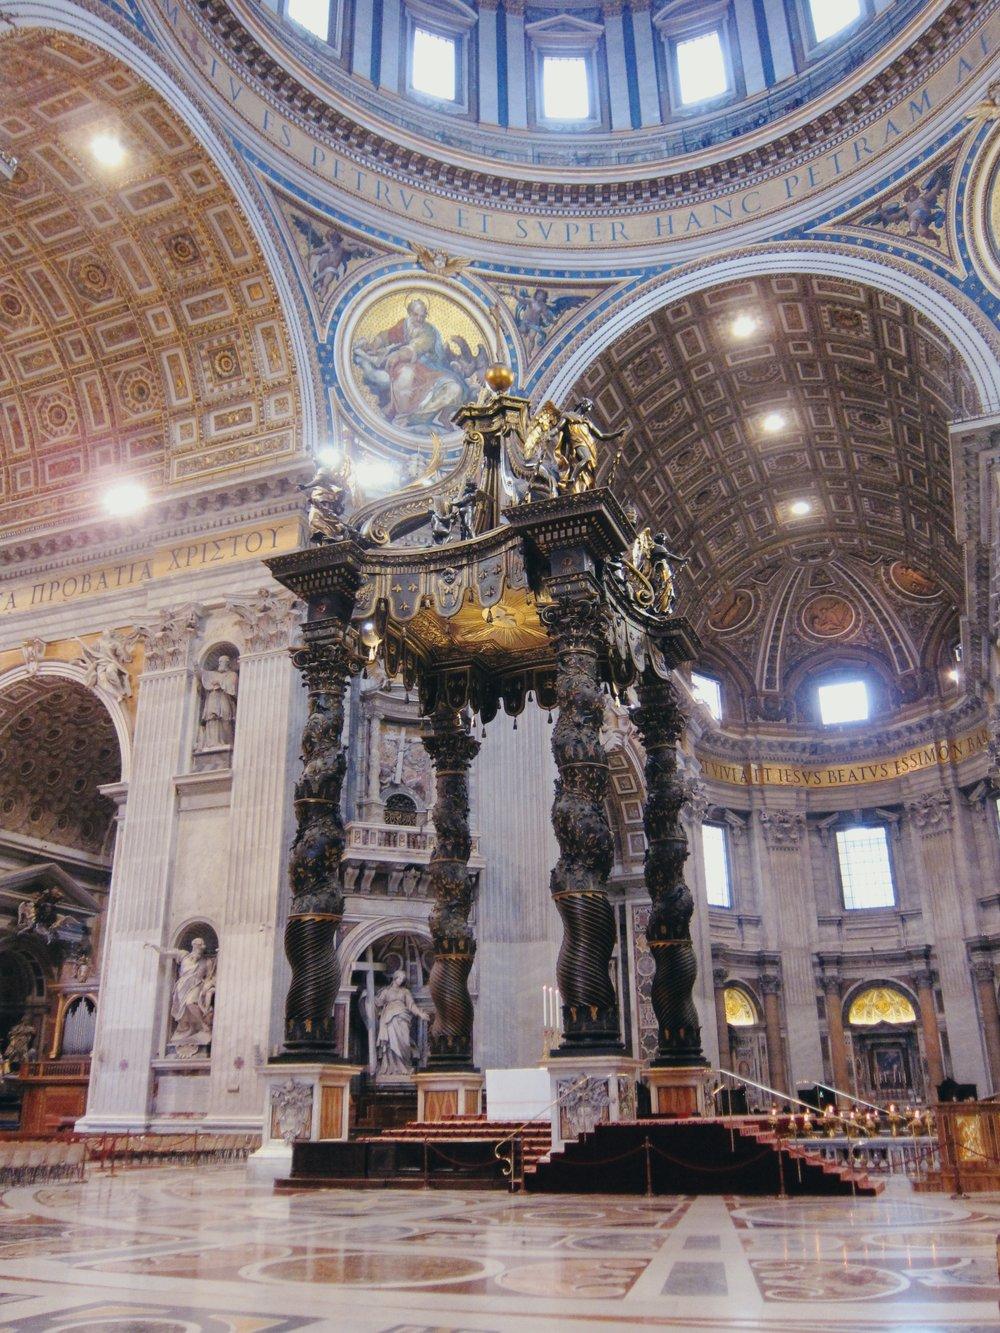 St. Peter's Basilica: Bernini's baldachinno